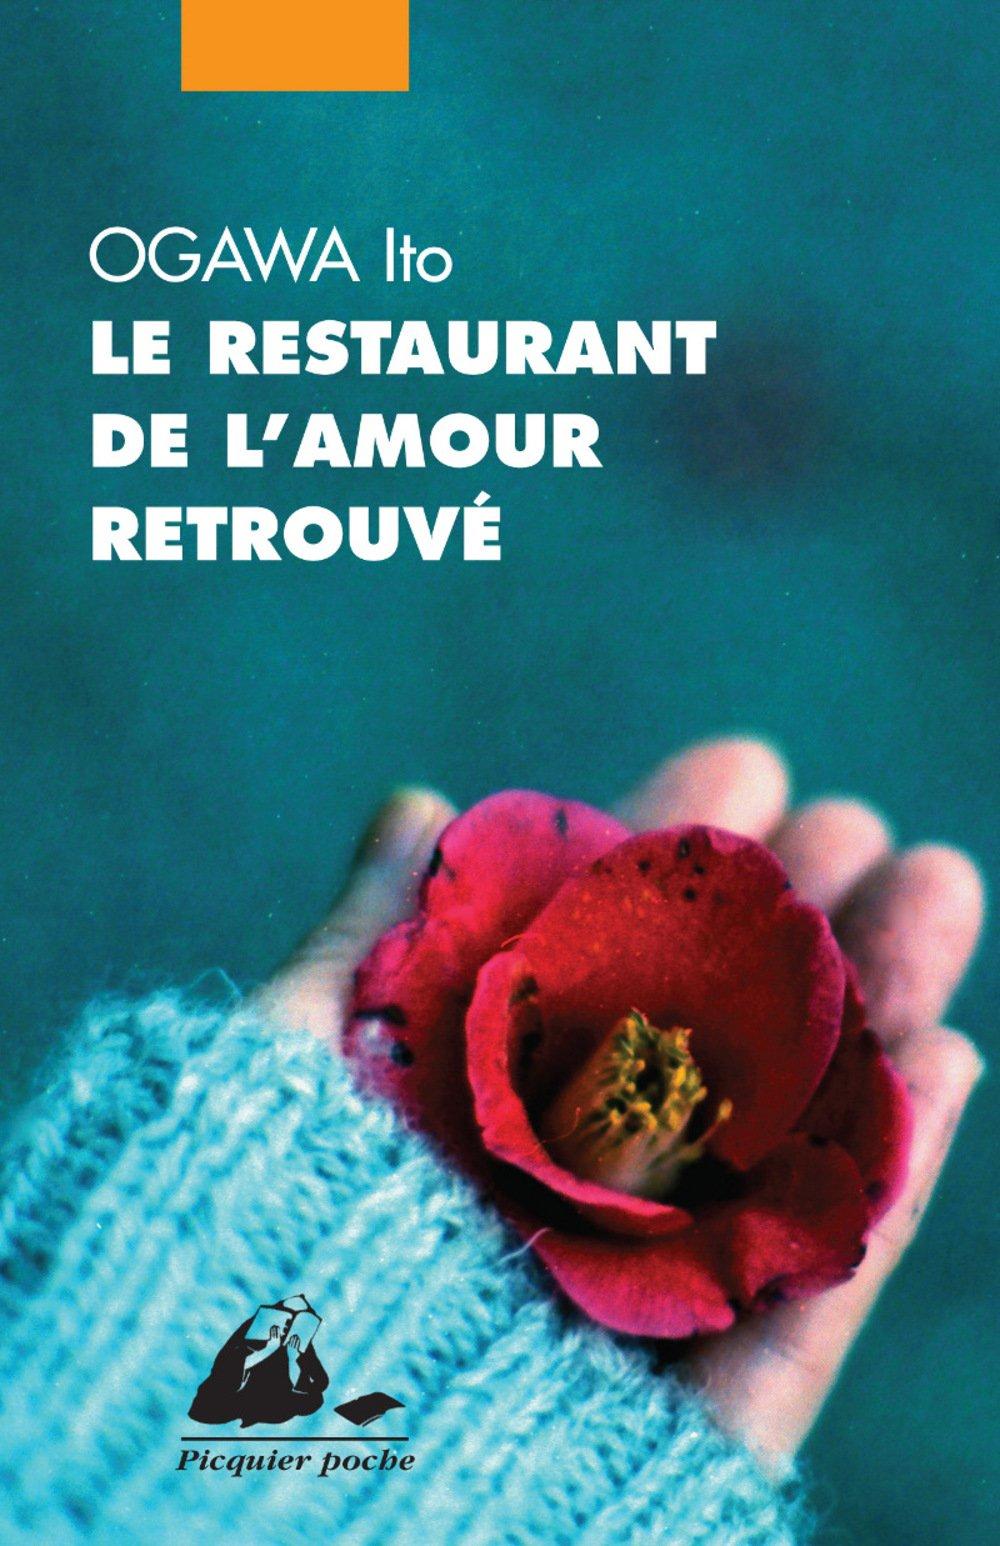 restaurant_amour_ogawa